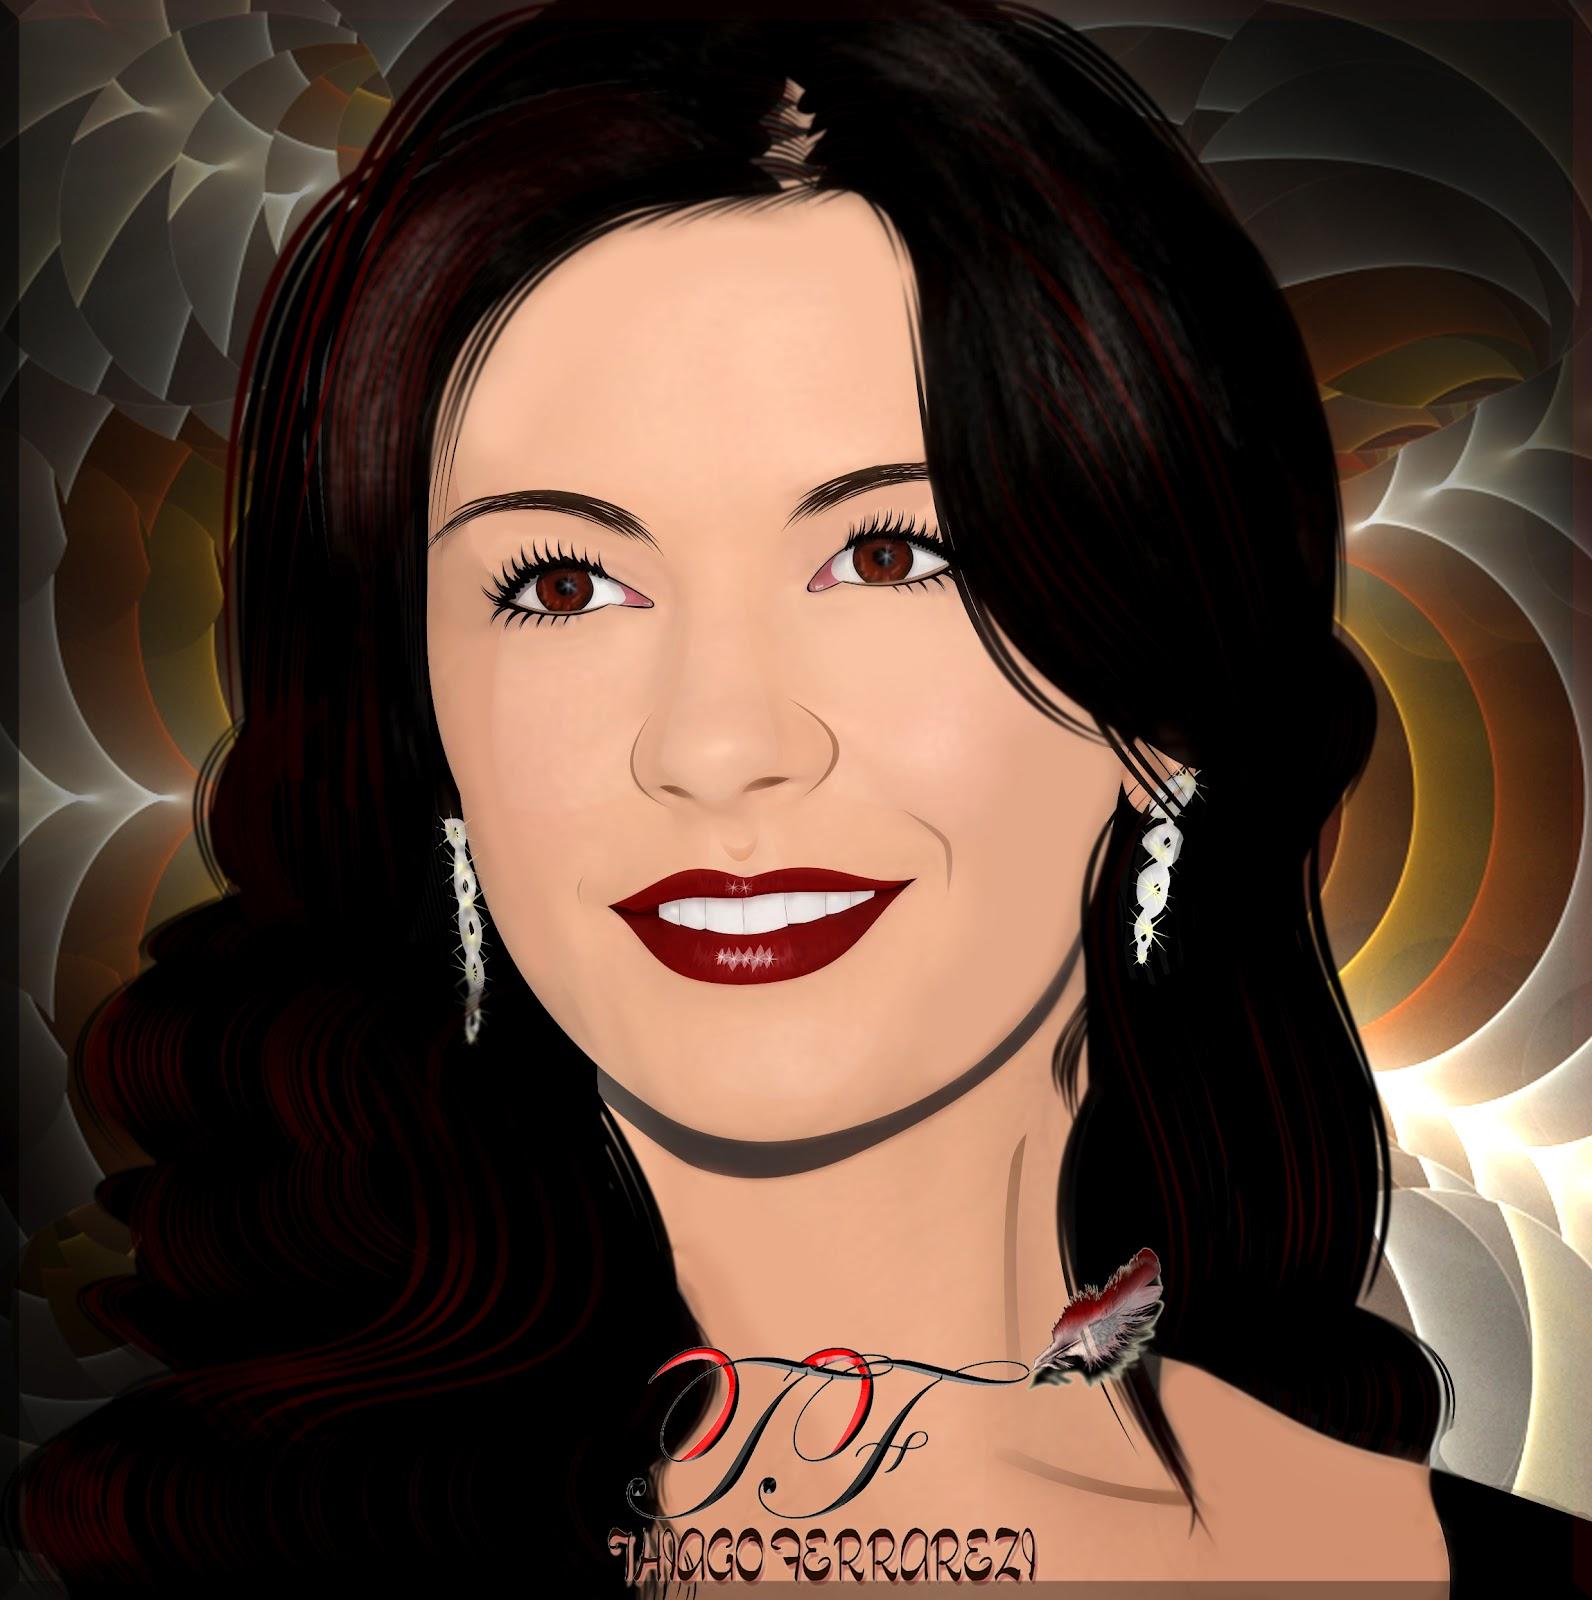 http://2.bp.blogspot.com/-CMZeo7Z1xz0/T_G1ACFnk-I/AAAAAAAAEow/a_3GPJDXqmM/s1600/Catherine-Zeta-Jones-Cartoon-3.jpg